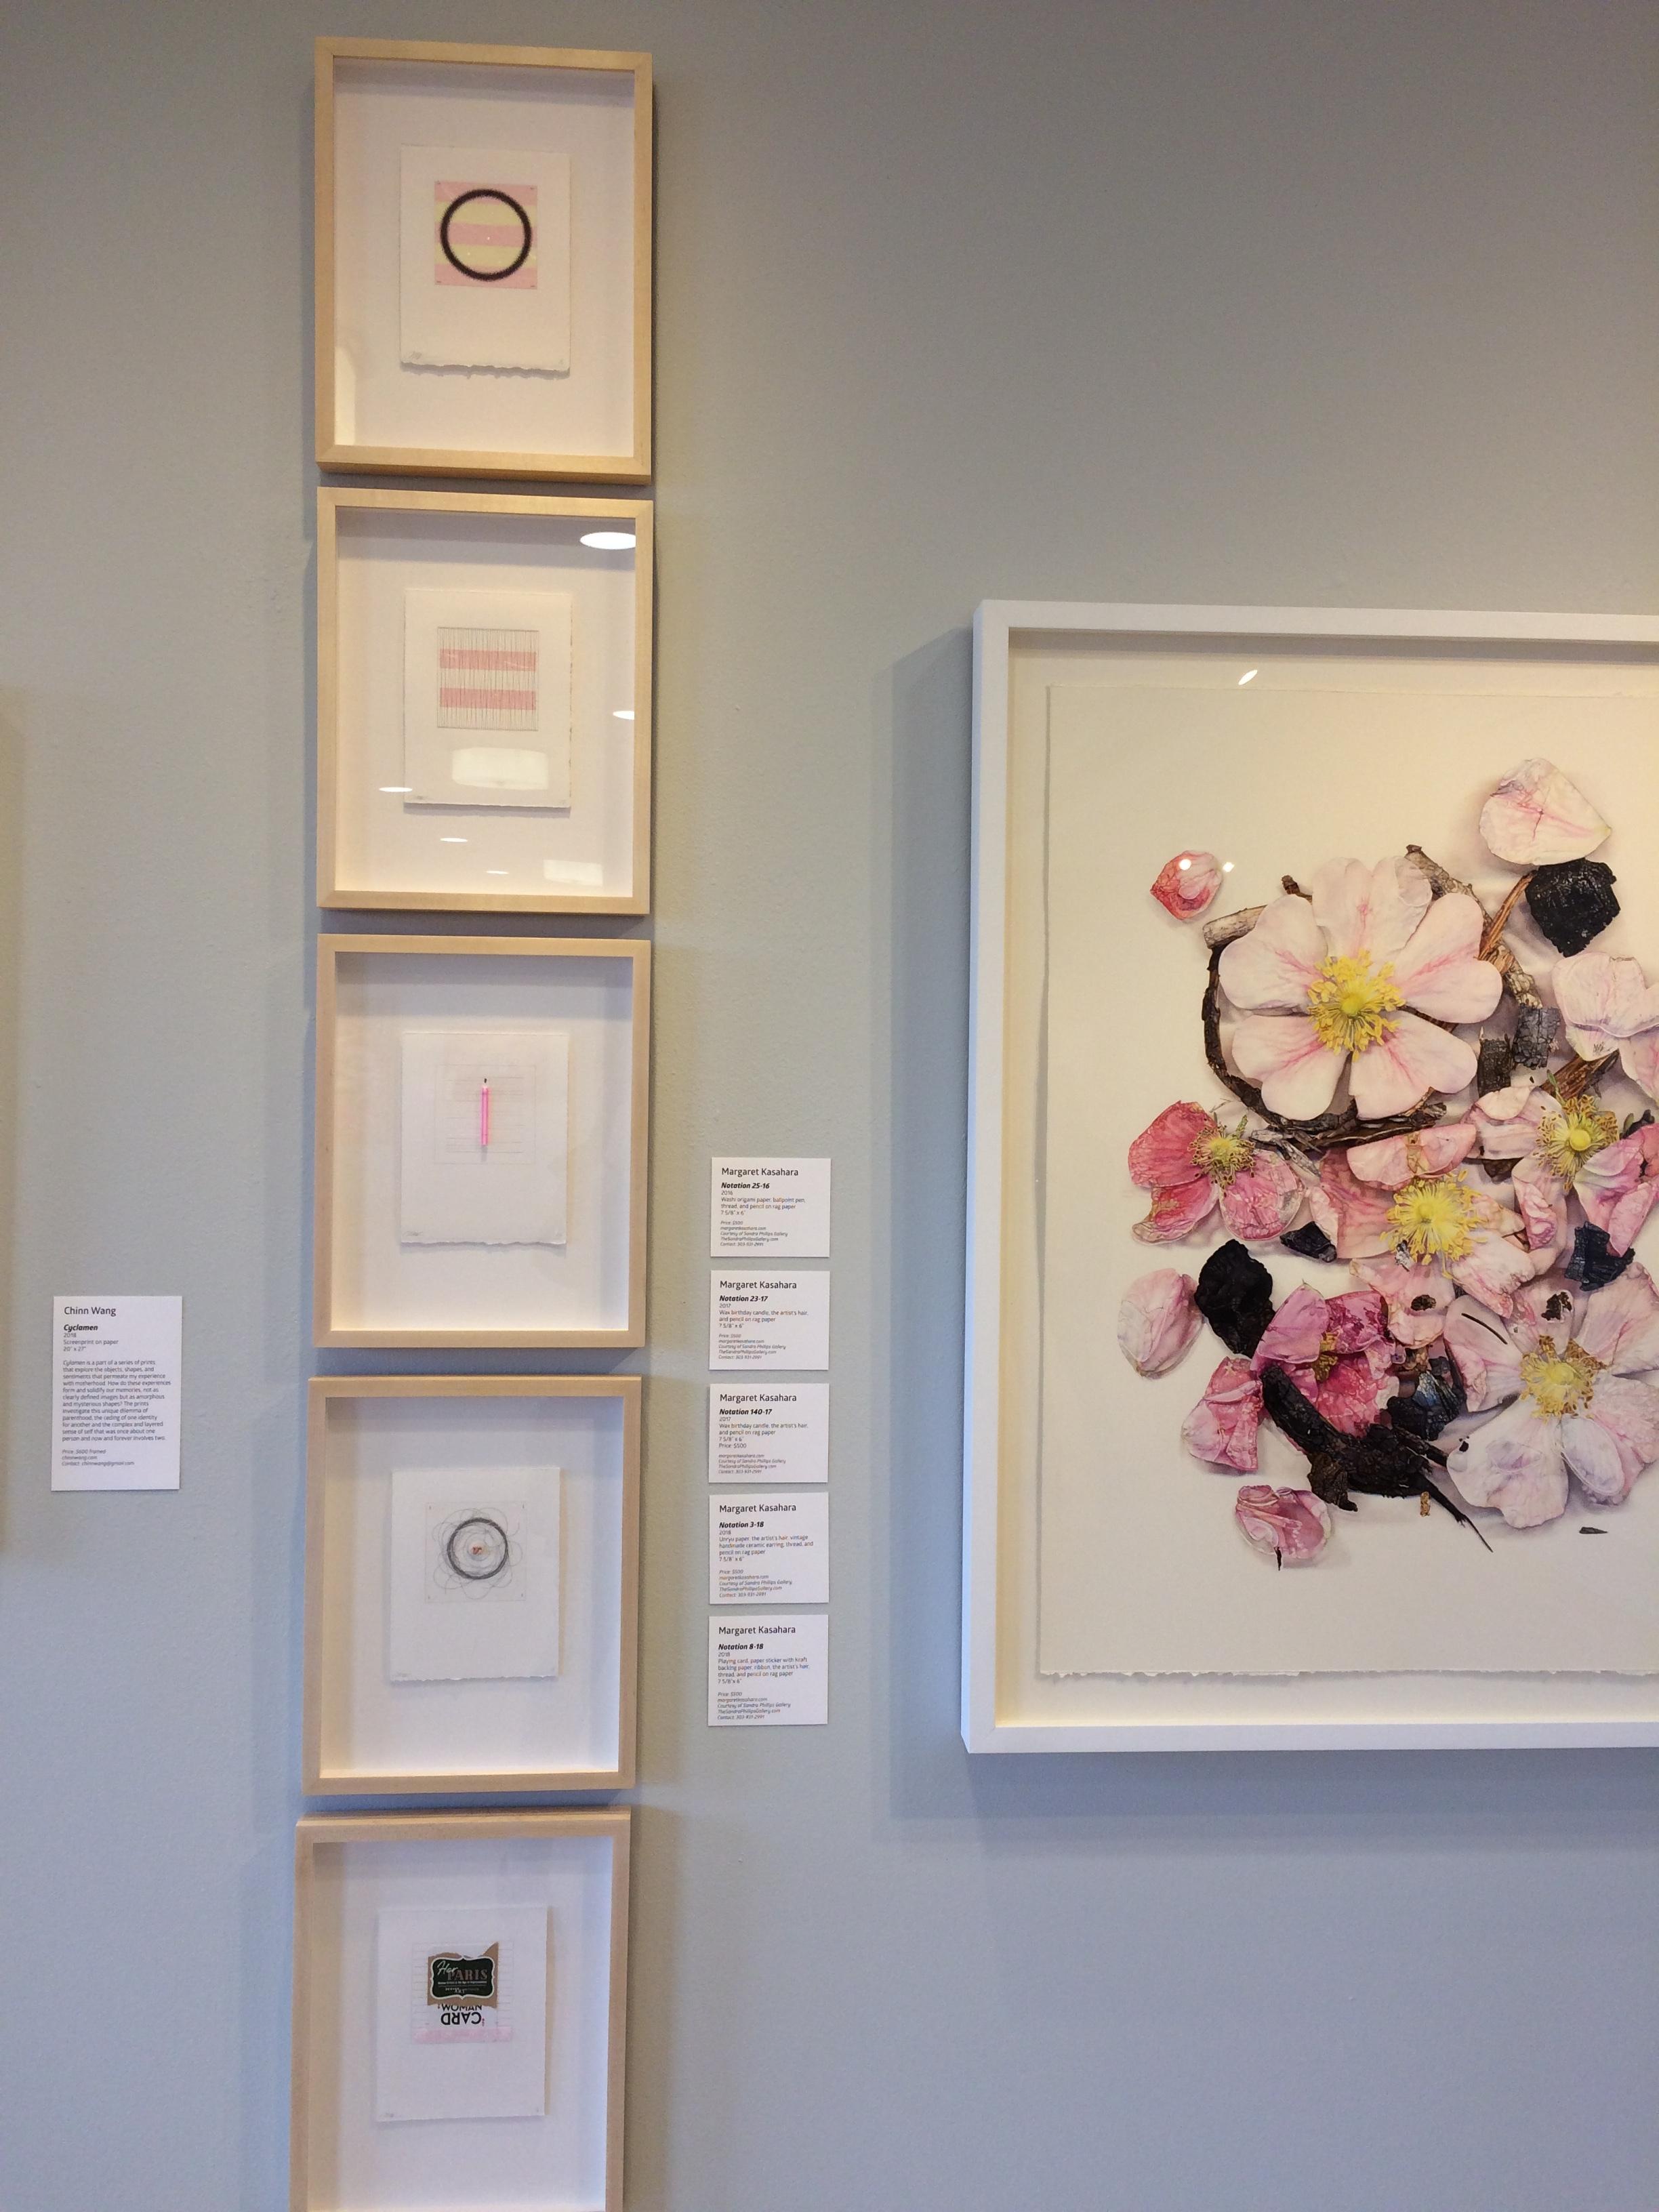 Margaret Kasahara -  Notation  series - Multimedia and Anna Kaye -  Rosa woodsii  - Watercolor on Paper